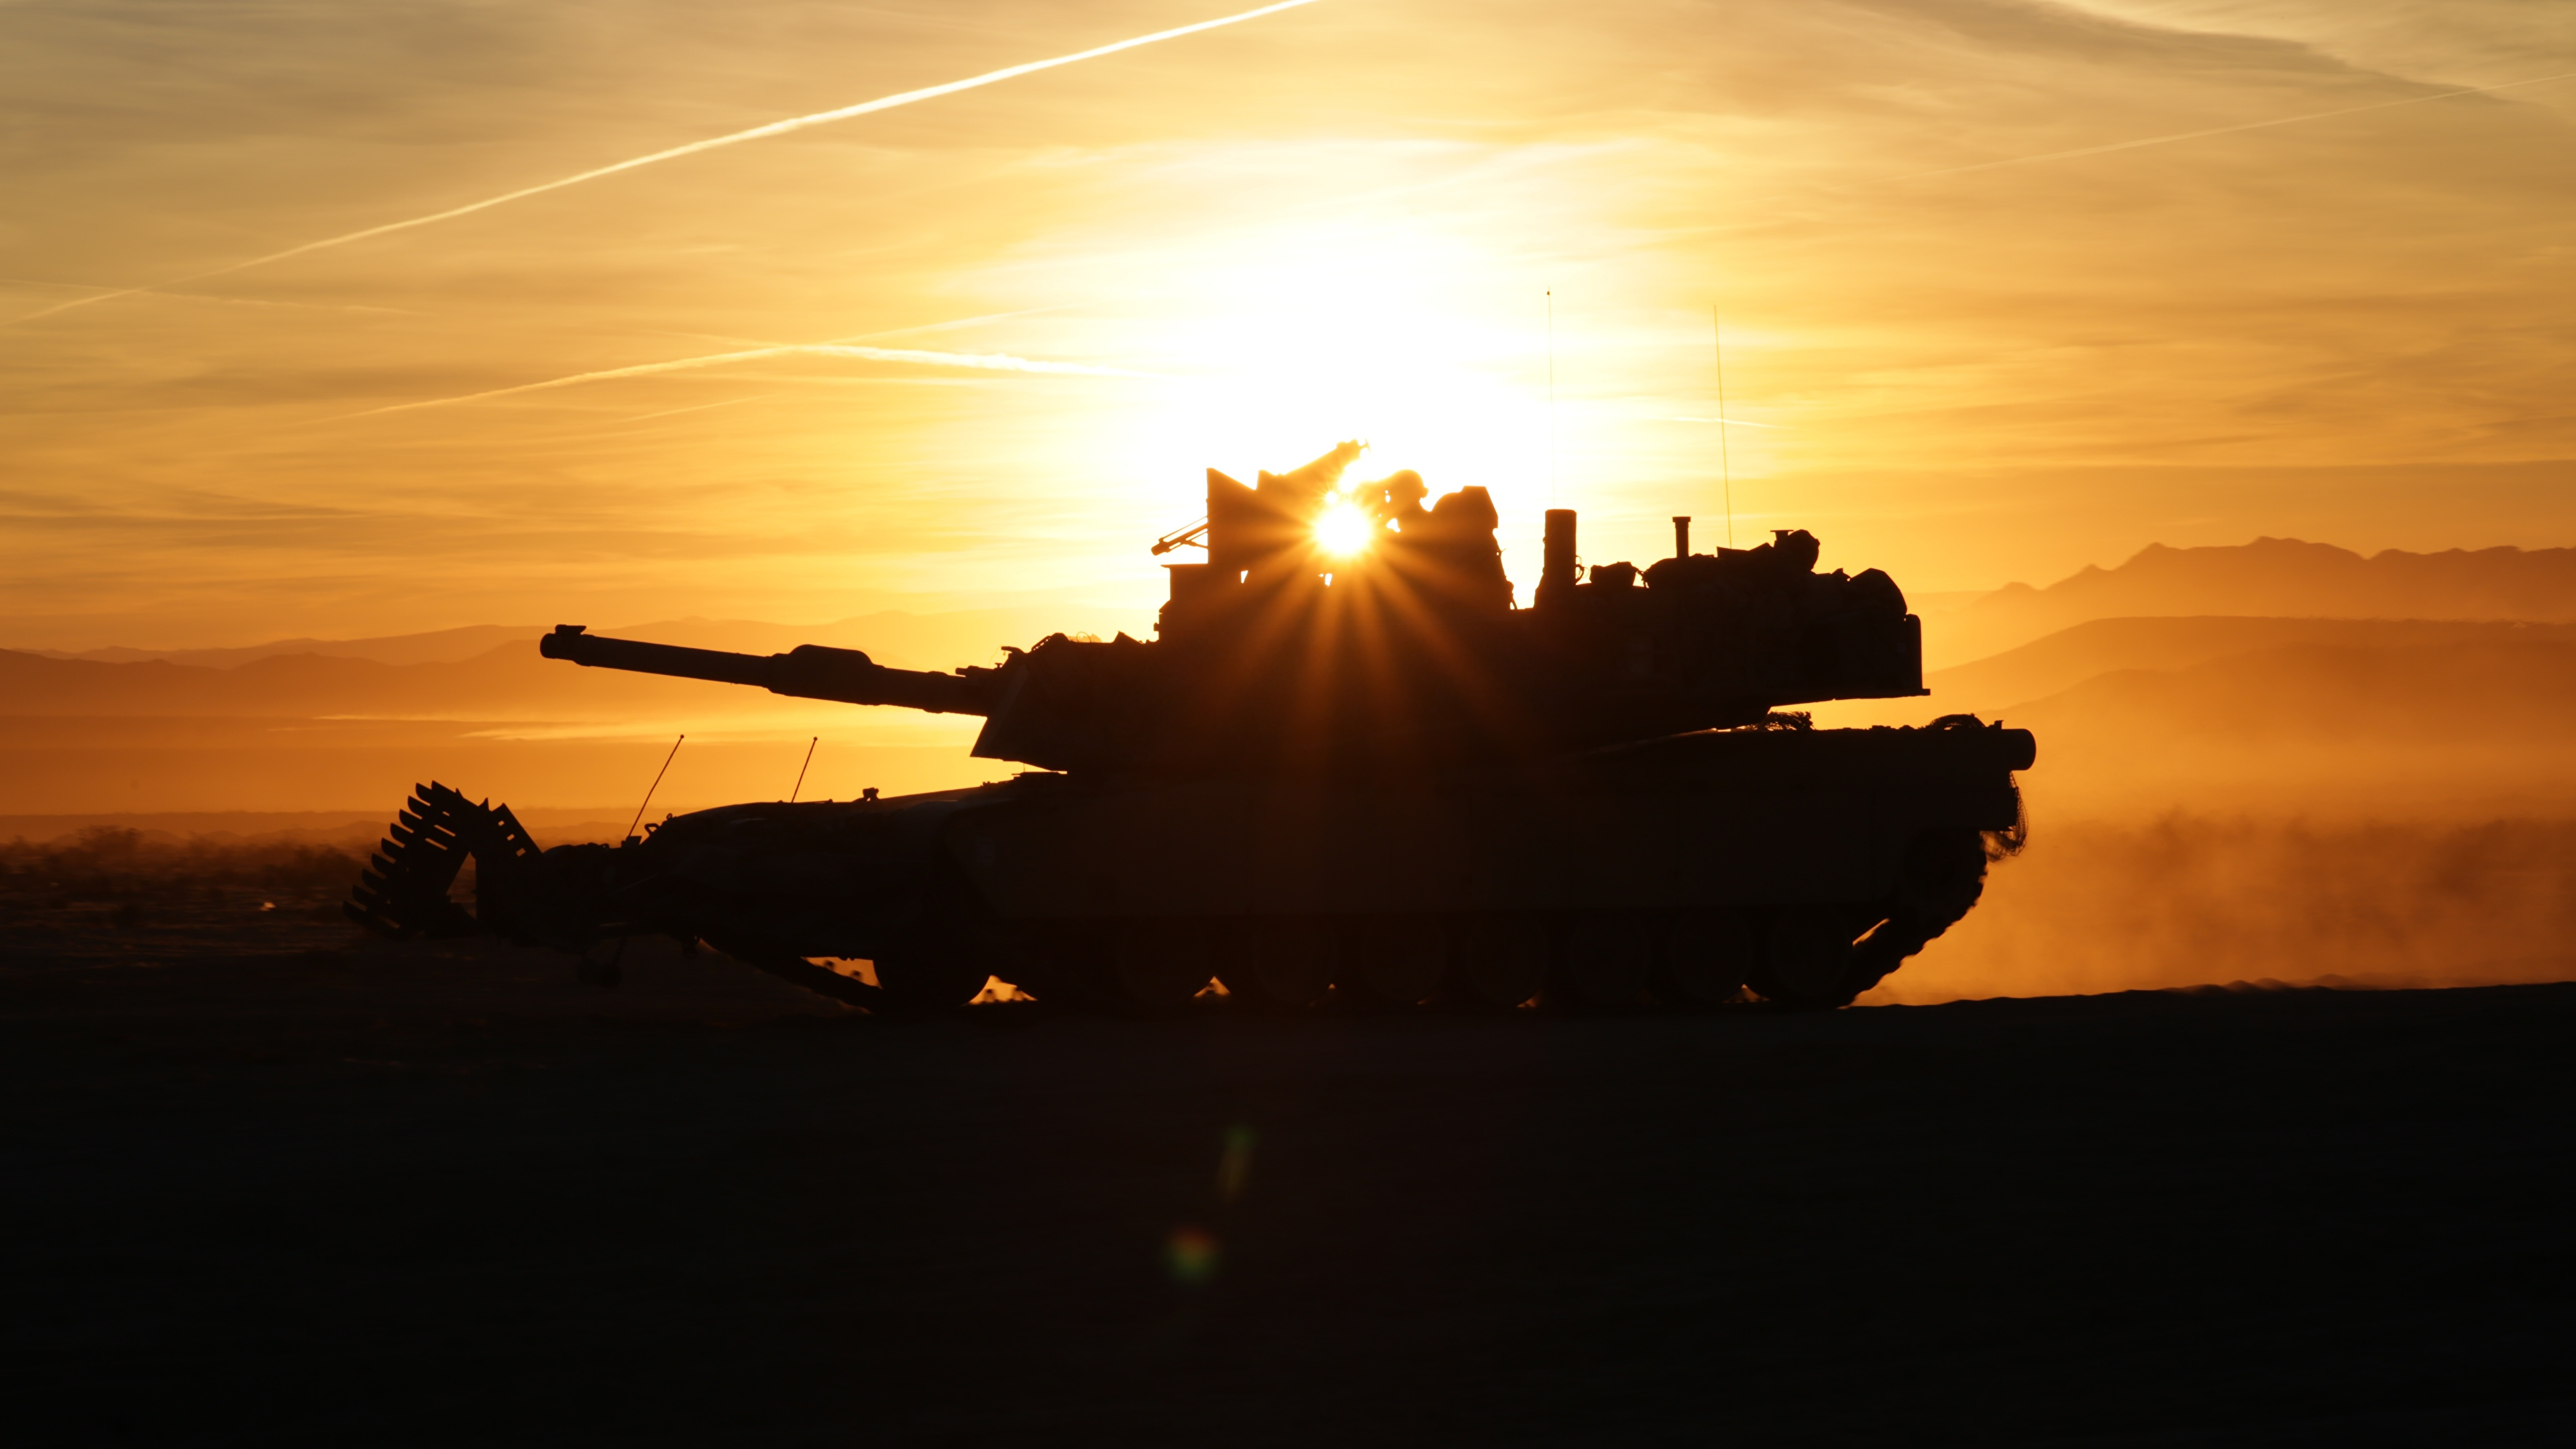 Картинка Лучи света Абрамс М1 Танки силуэта M1A2 Армия 3840x2160 танк Силуэт силуэты военные